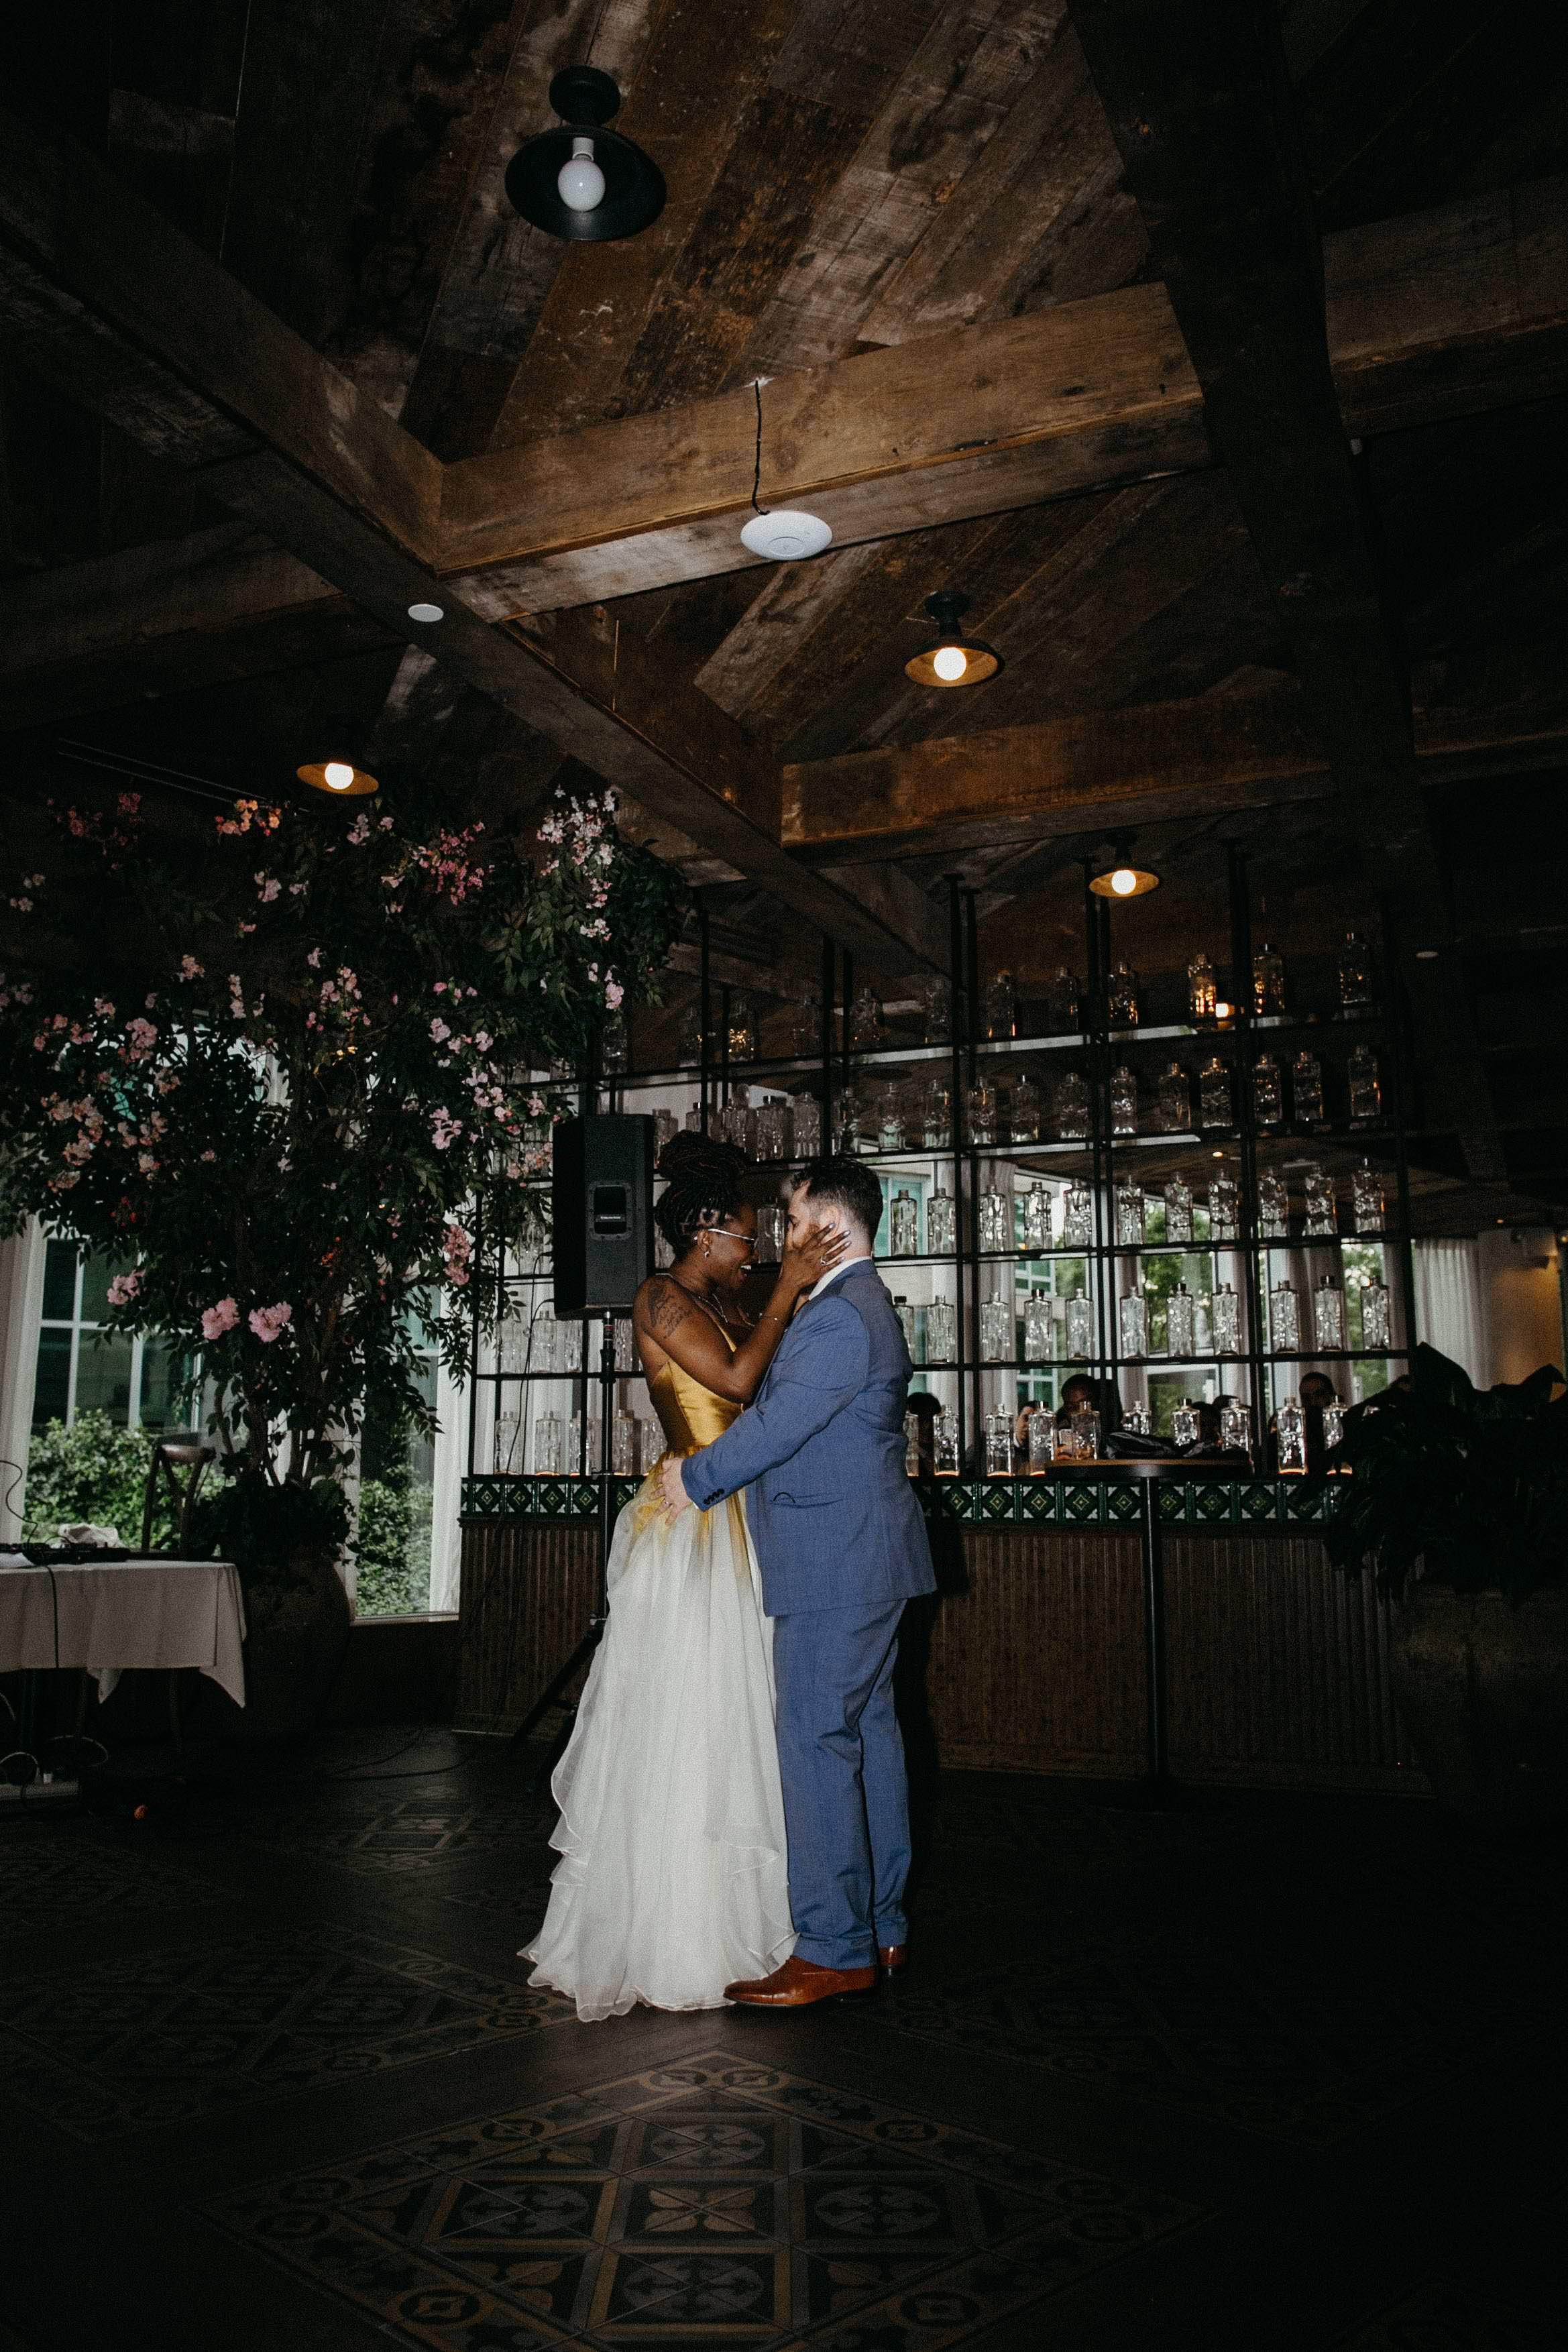 Sevlynn-Photography-Wedding-LIC-Landing-Maiella-NYC-62.jpg